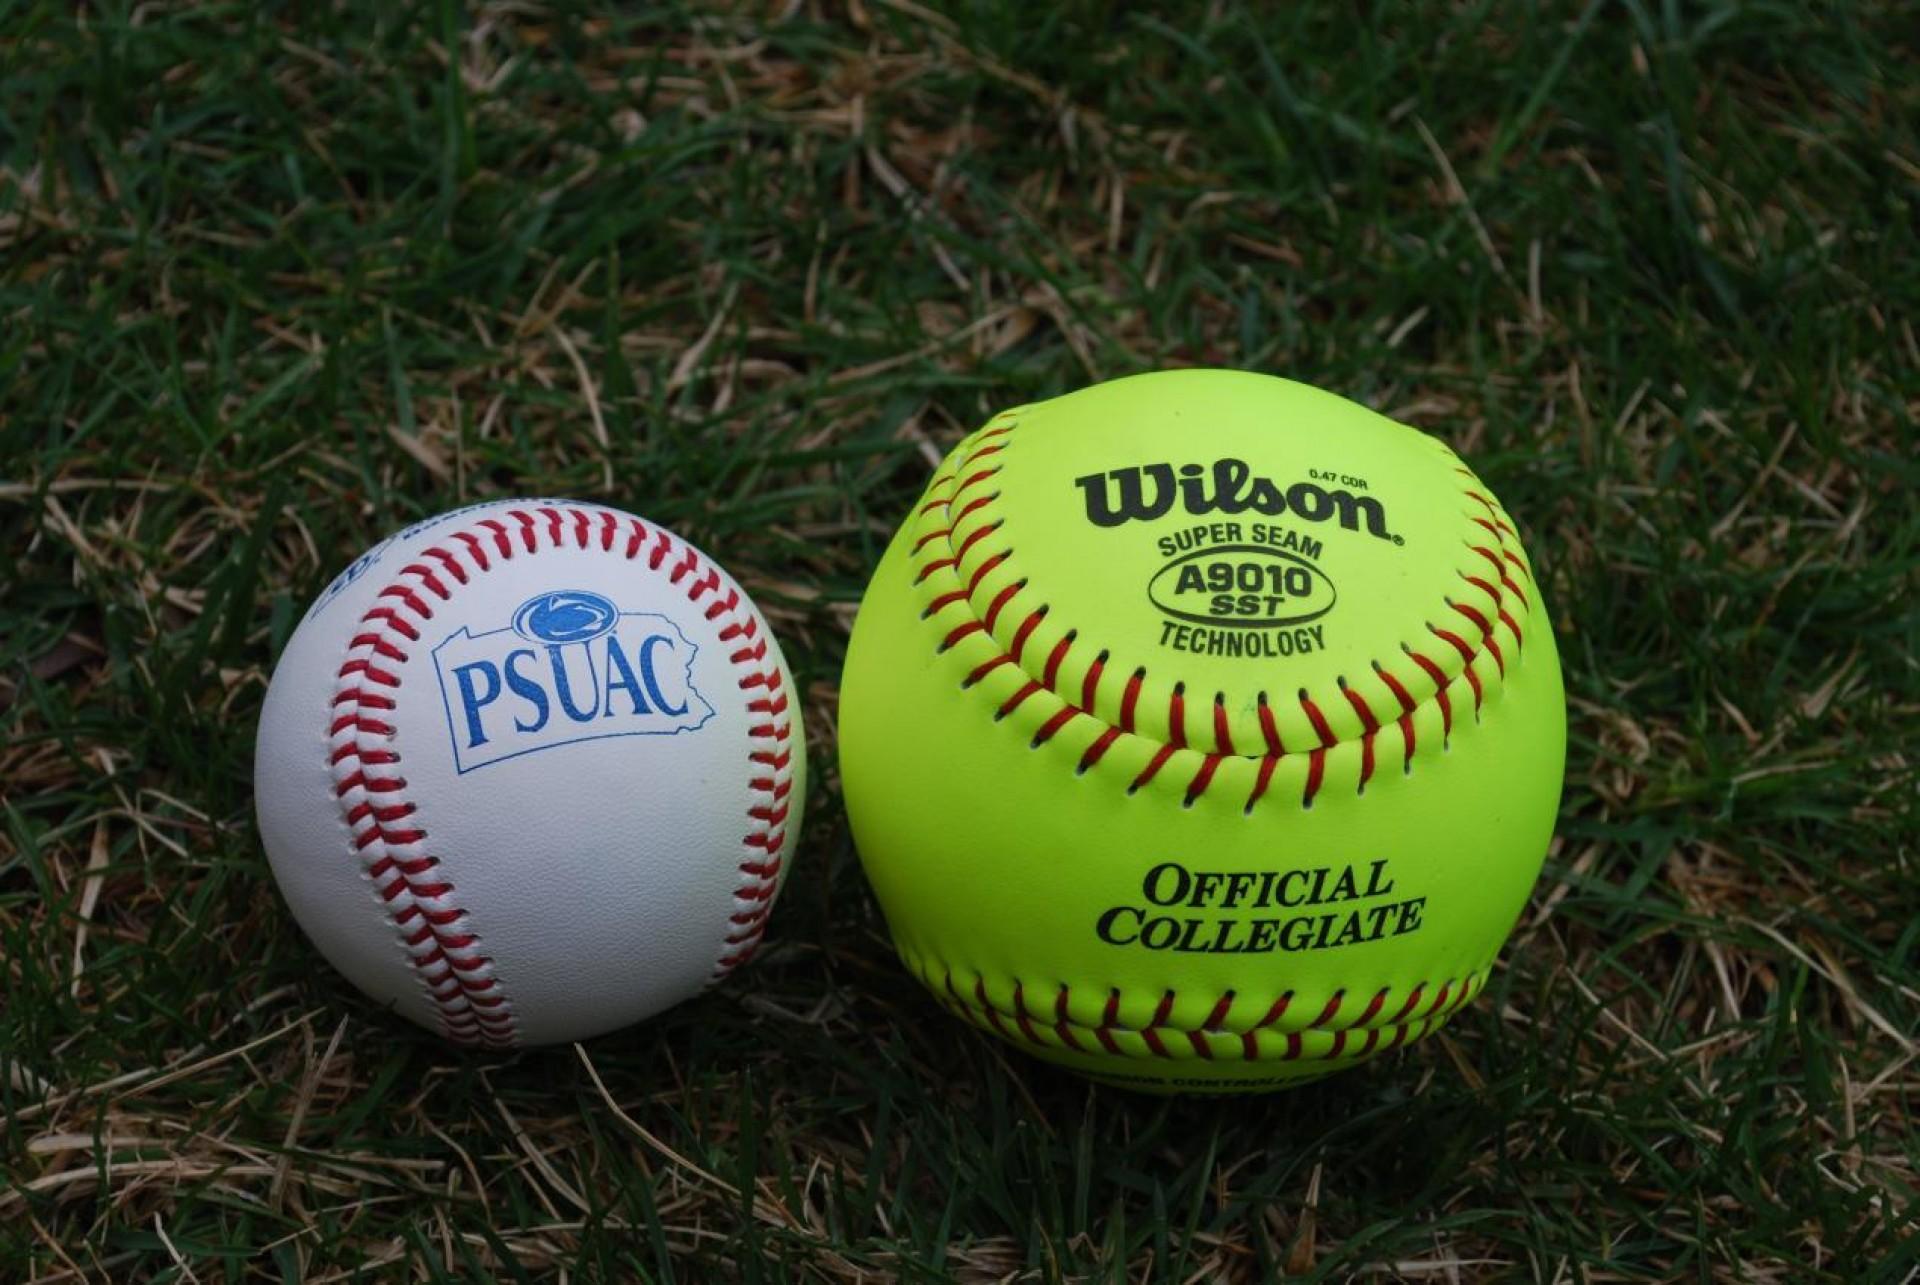 005 Baseball Vs Softballfit12702c850ssl1 Why I Love Softball Essay Unforgettable 1920